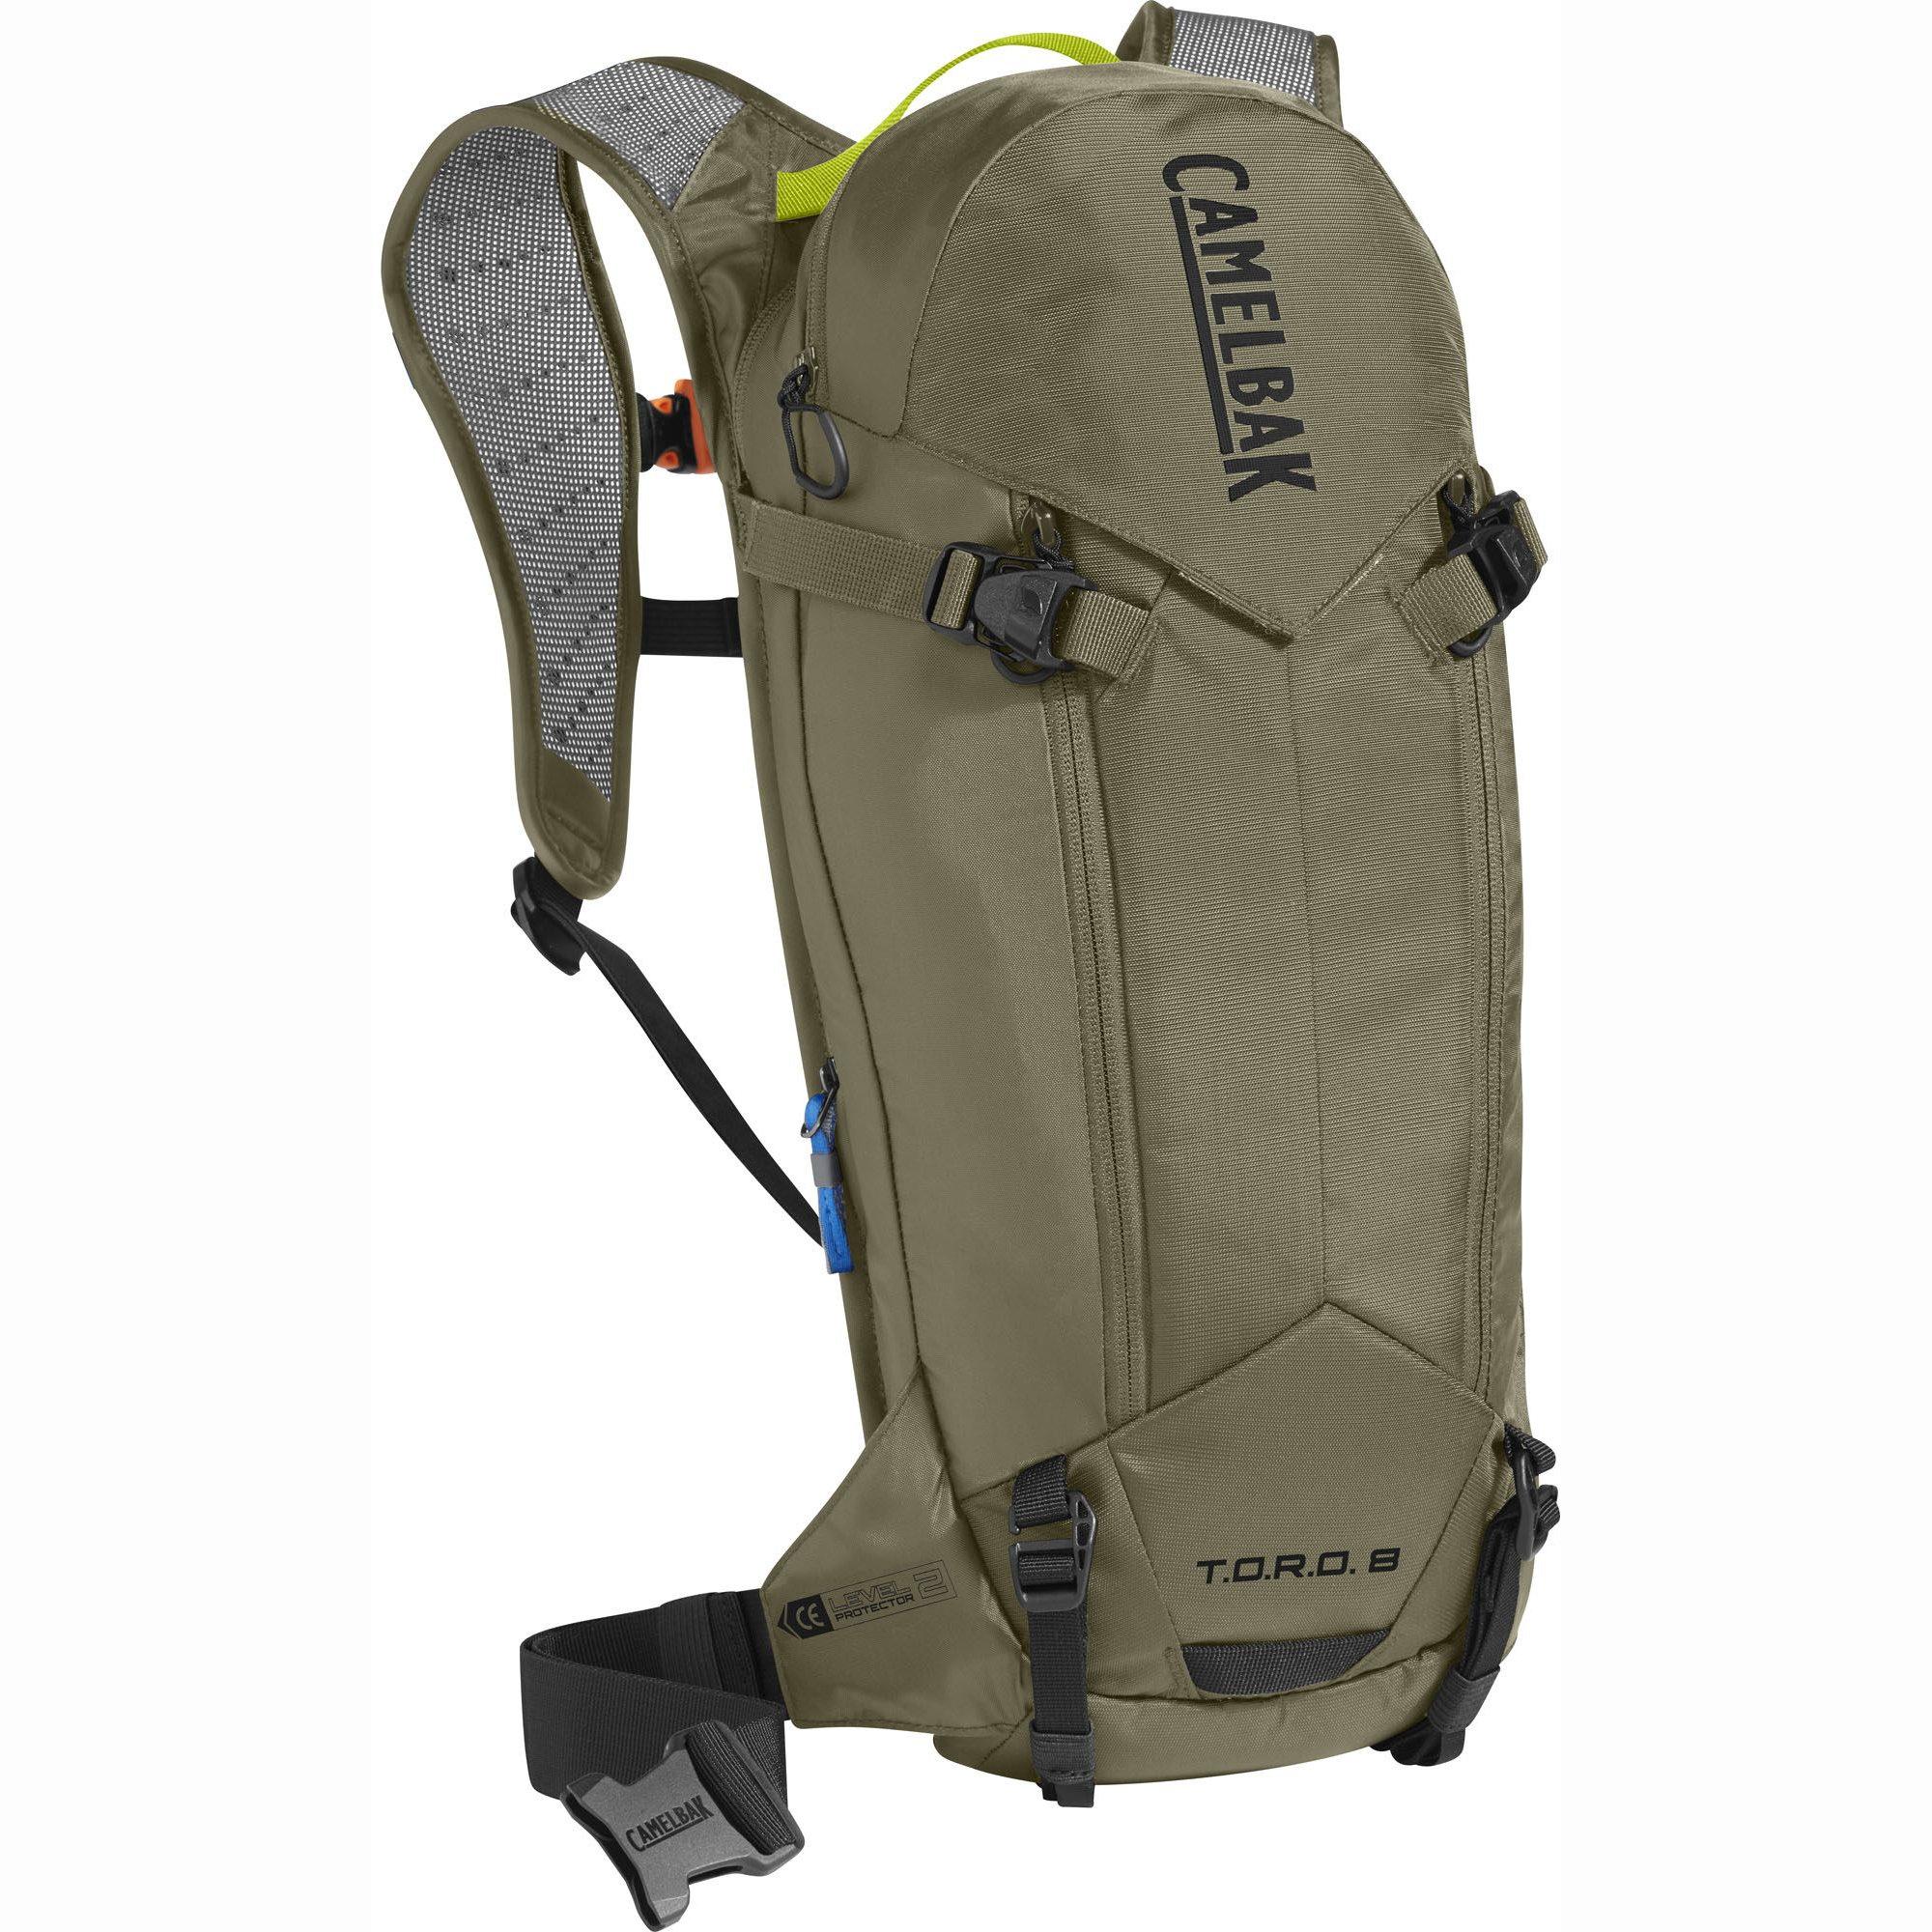 Plecak rowerowy | Camelbak T.O.R.O. Protector 8 za £52.00